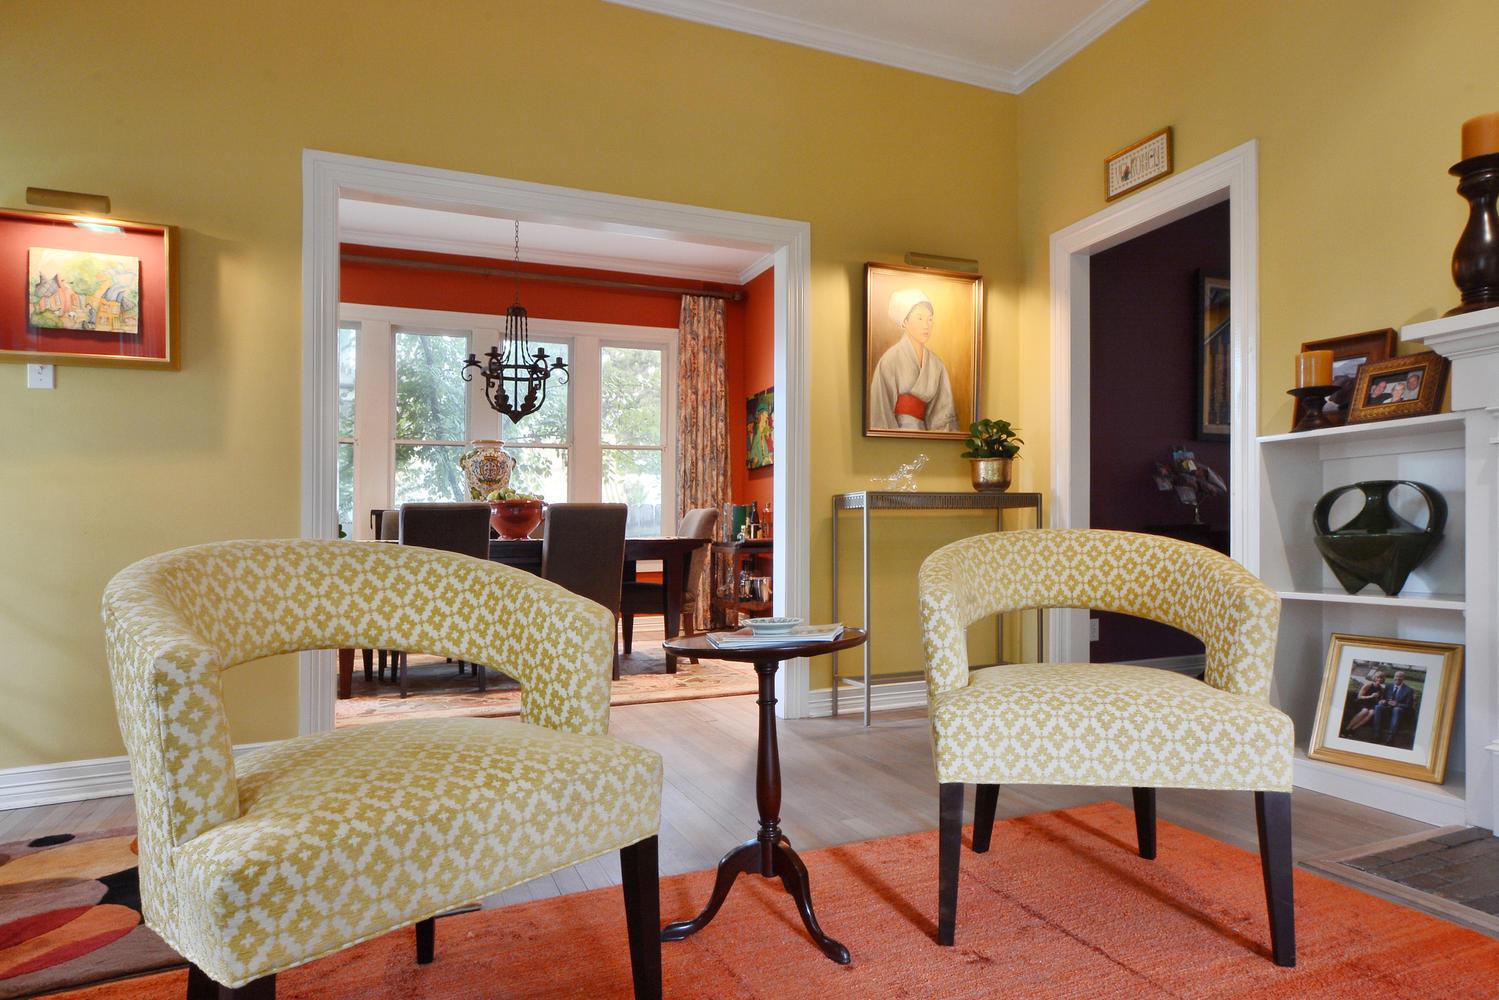 Nine design group austin texas residential interior for Residential interior designs